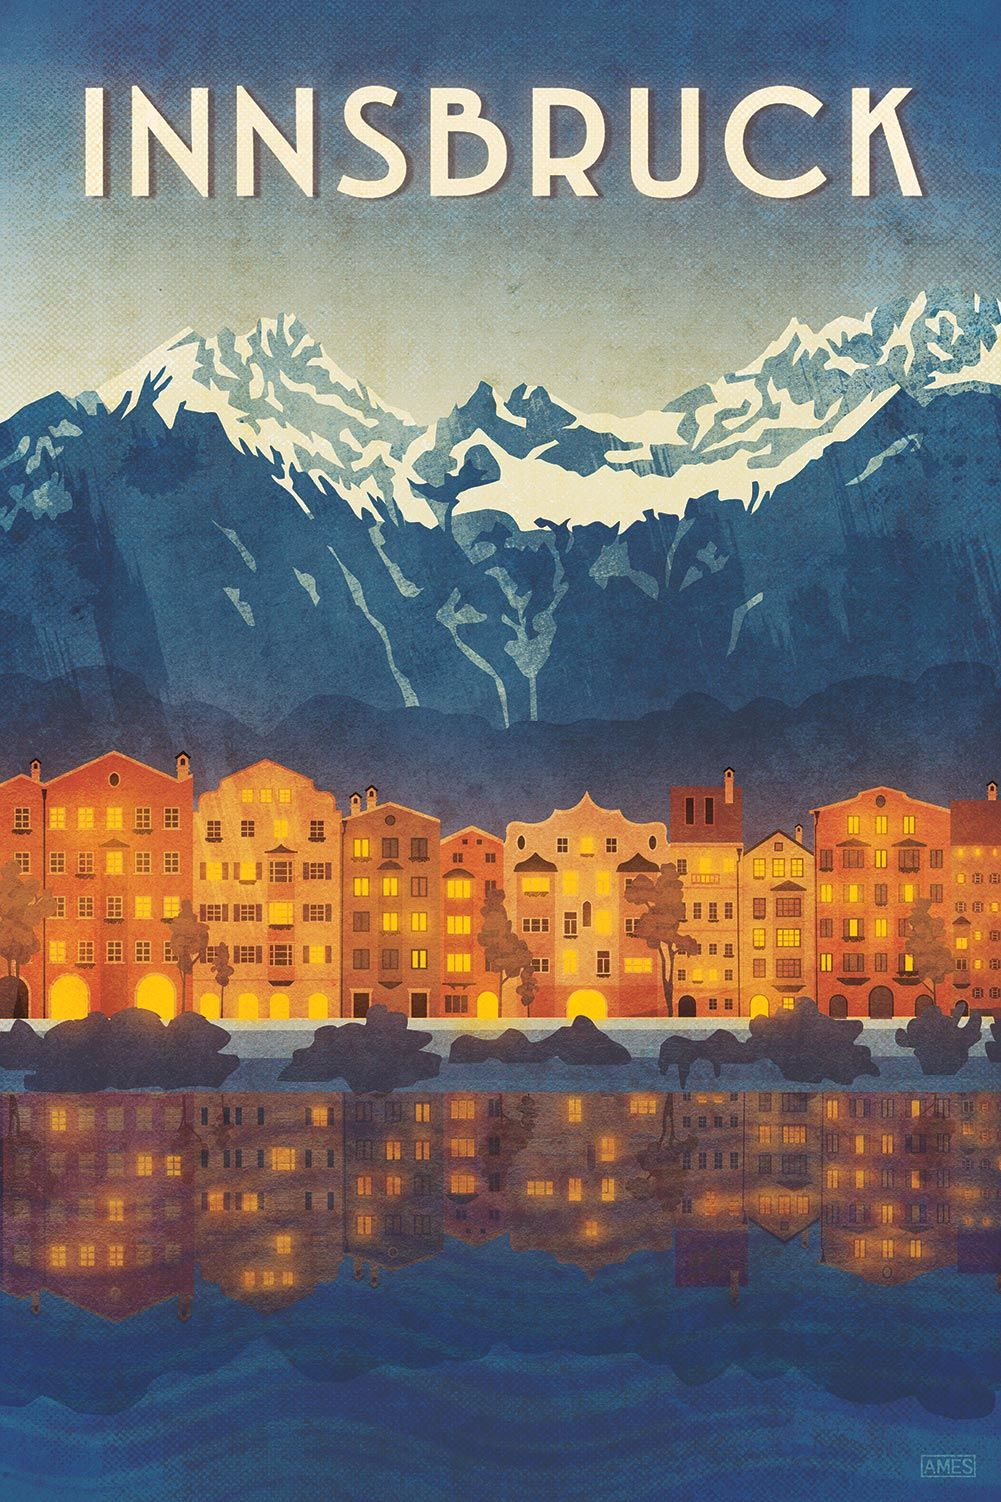 , Innsbruck Austria Travel Poster, My Travels Blog 2020, My Travels Blog 2020